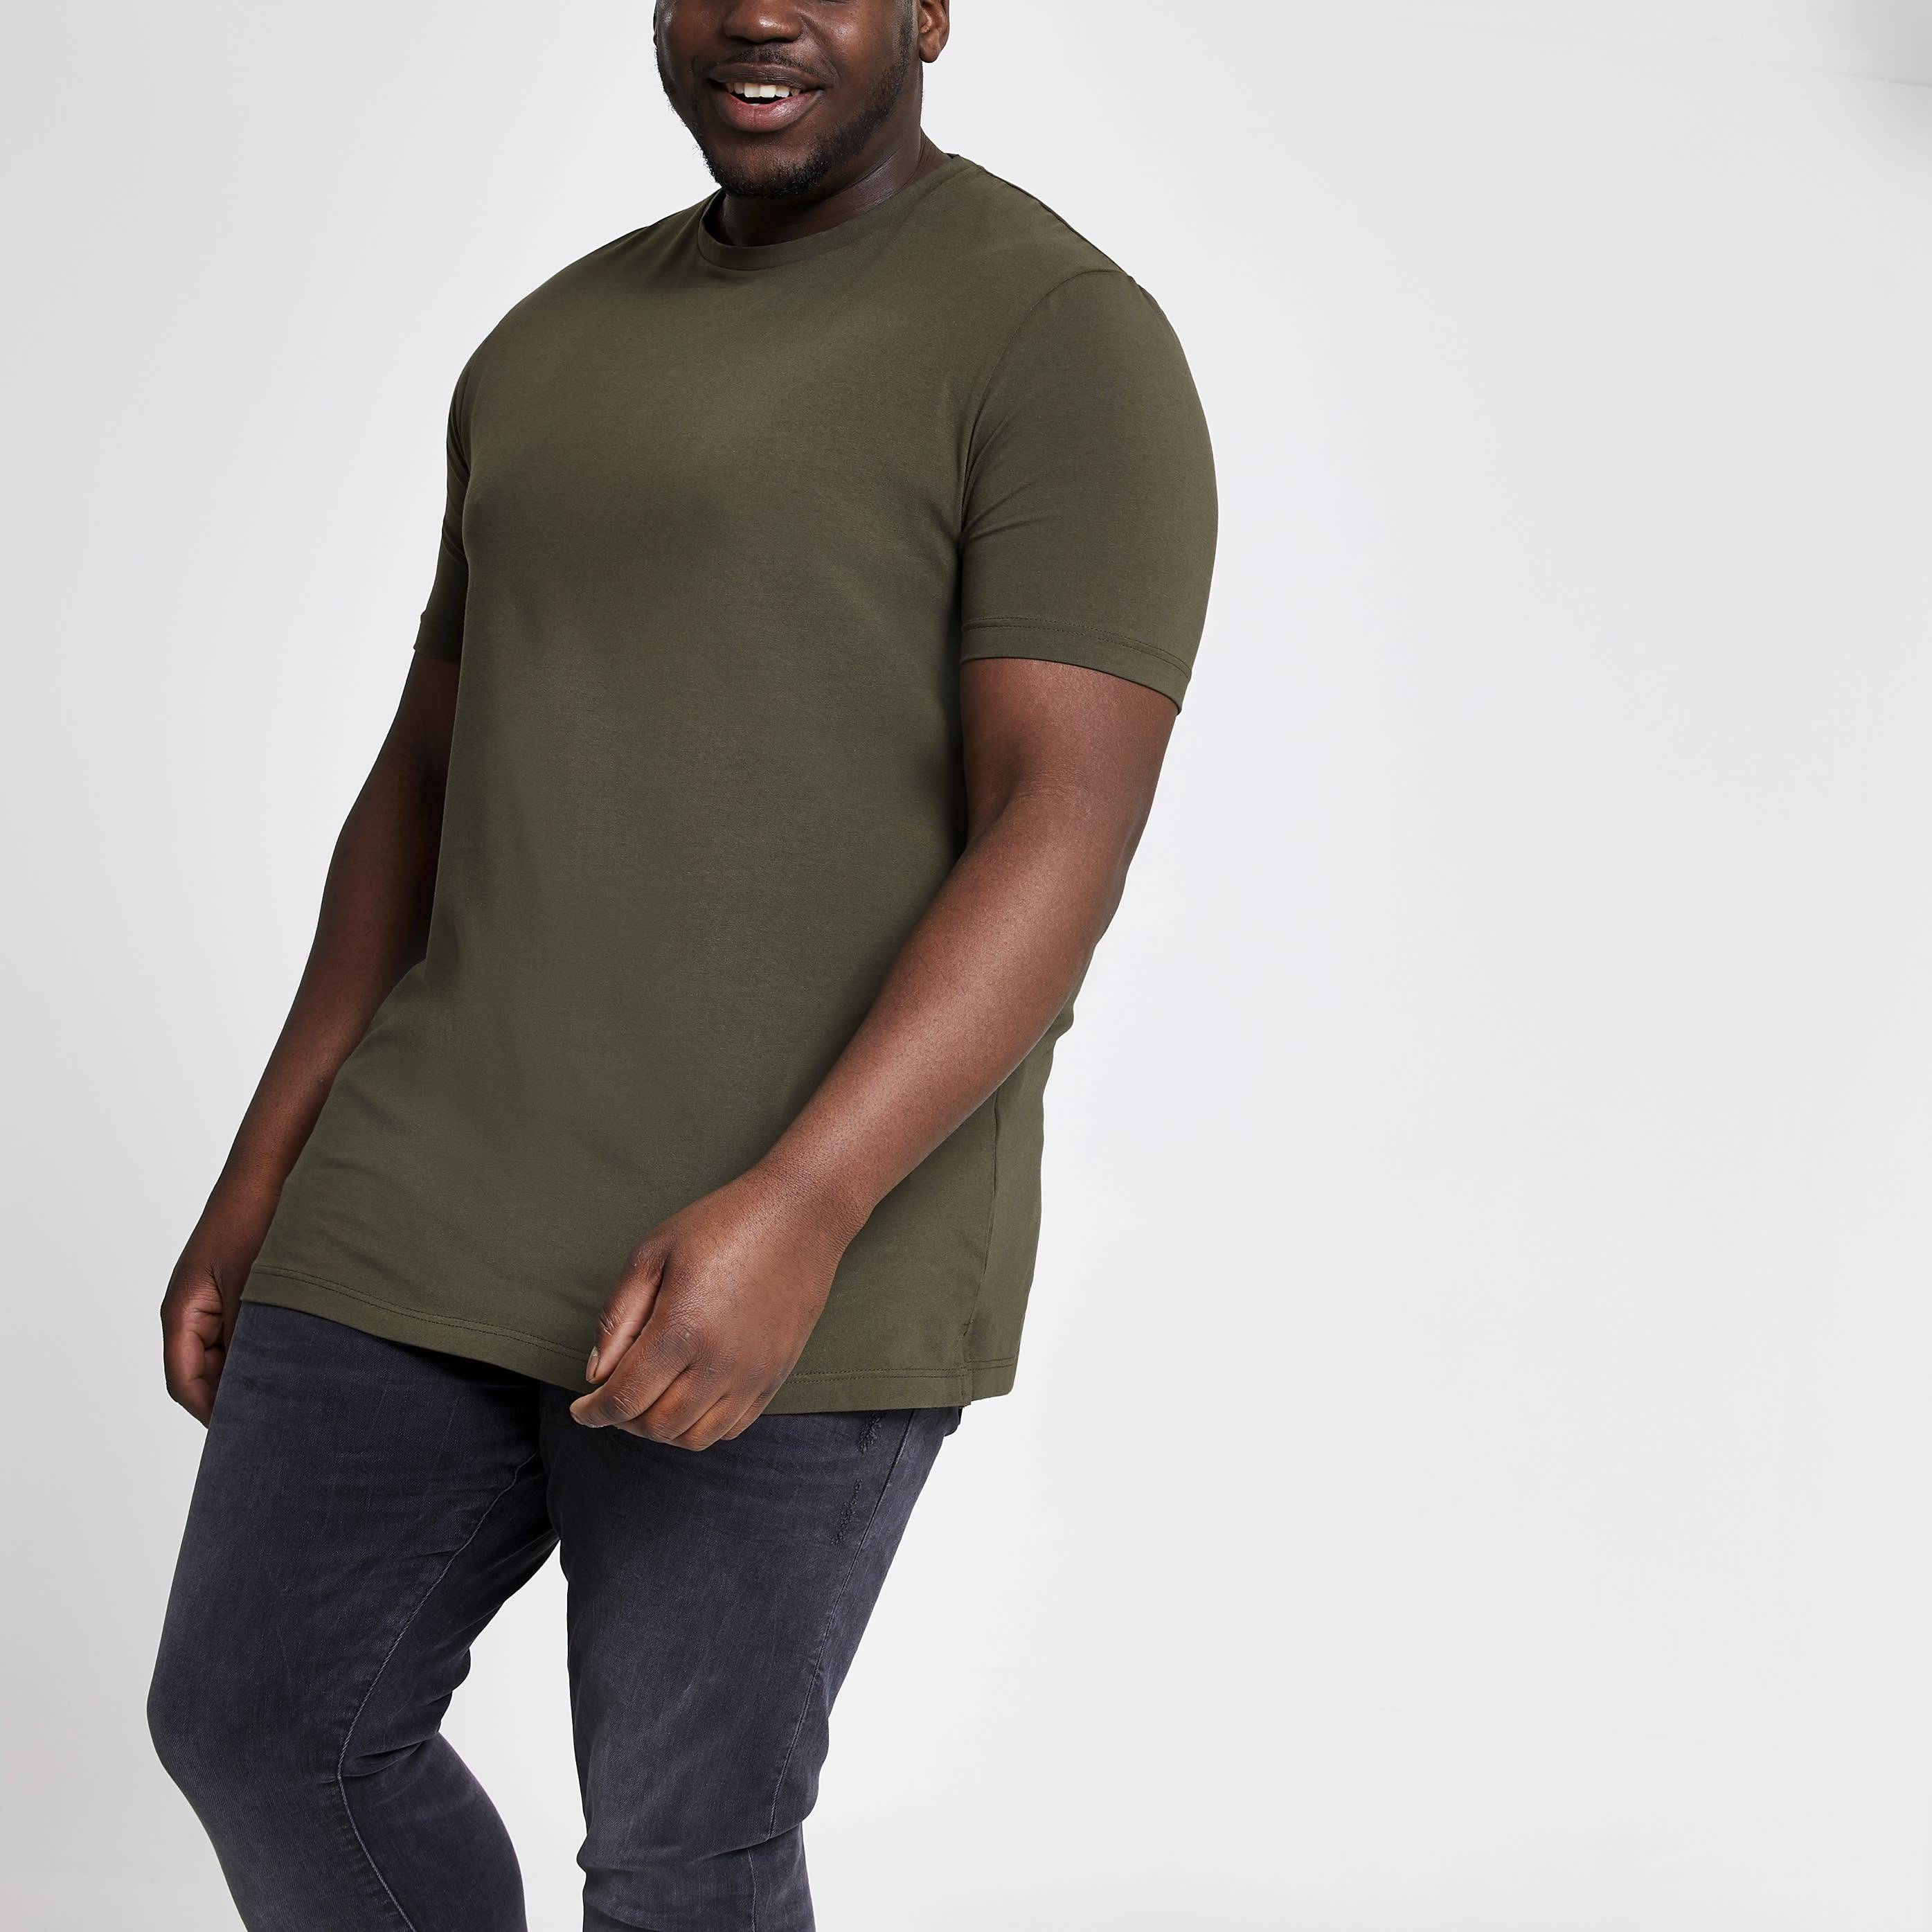 River Island Mens Big and Tall dark Green muscle fit T-shirt (XXXXXL)